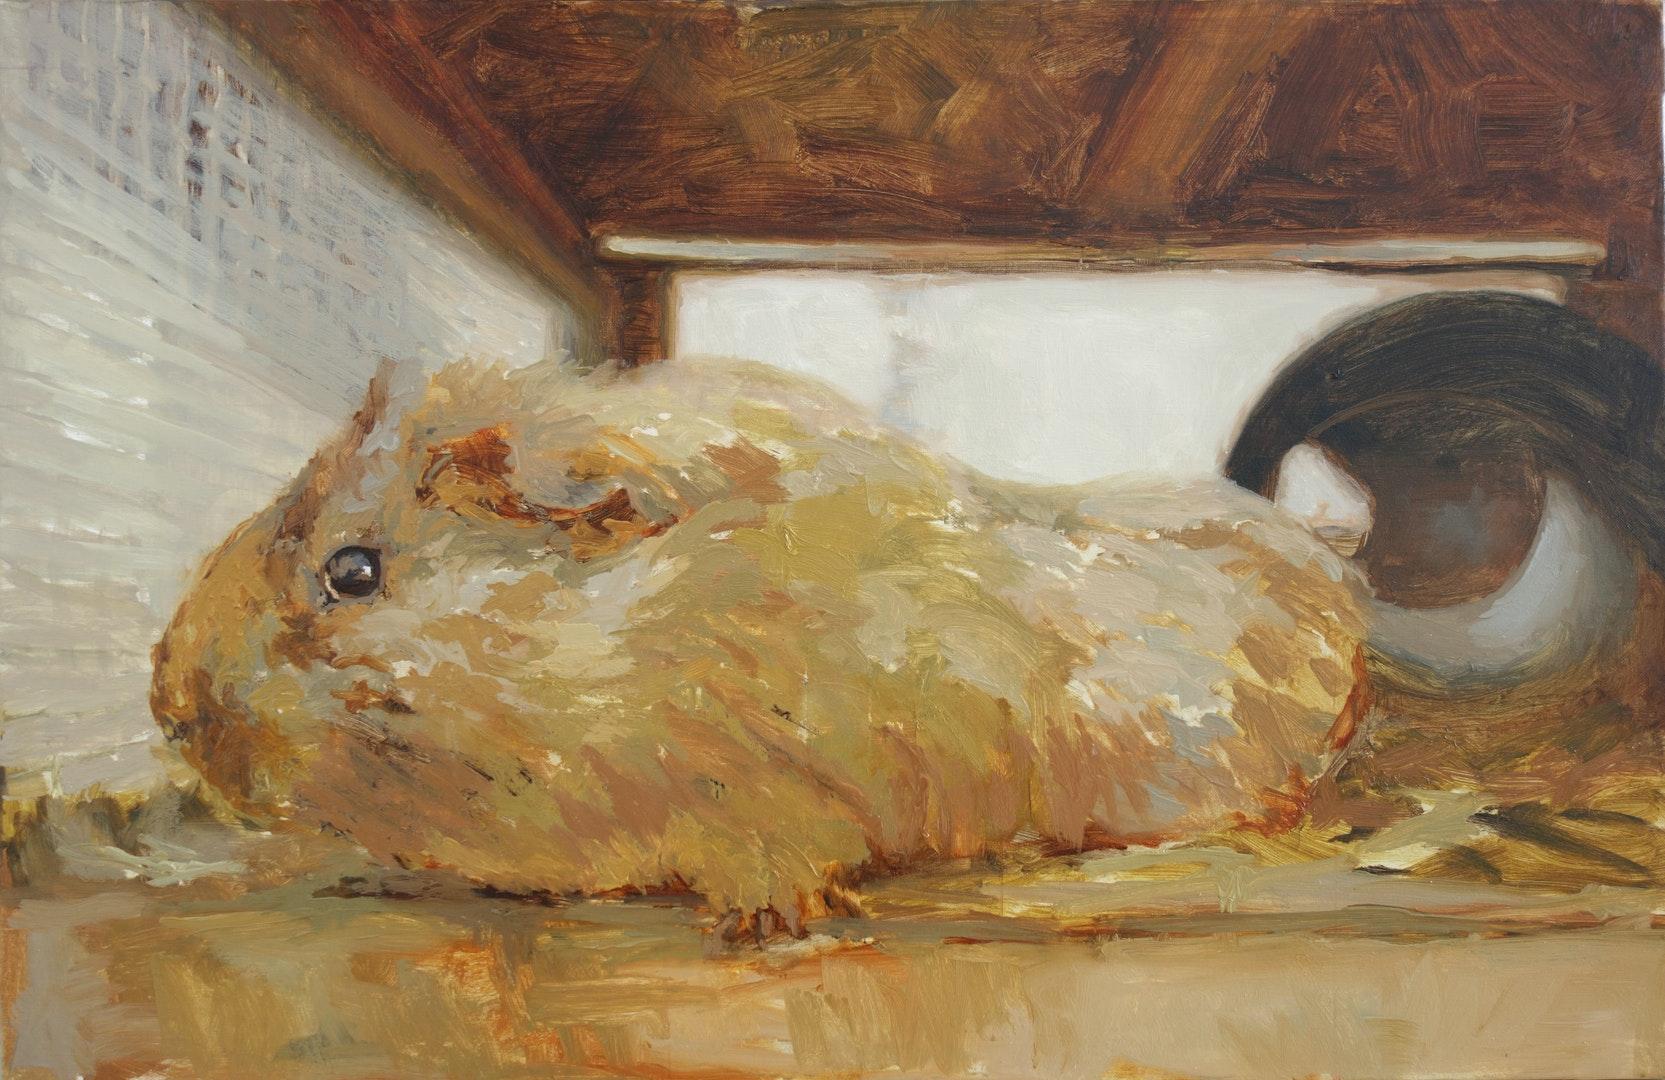 'Better', Ana del Valle Ojeda, Oil on canvas, 65 x 100 cm